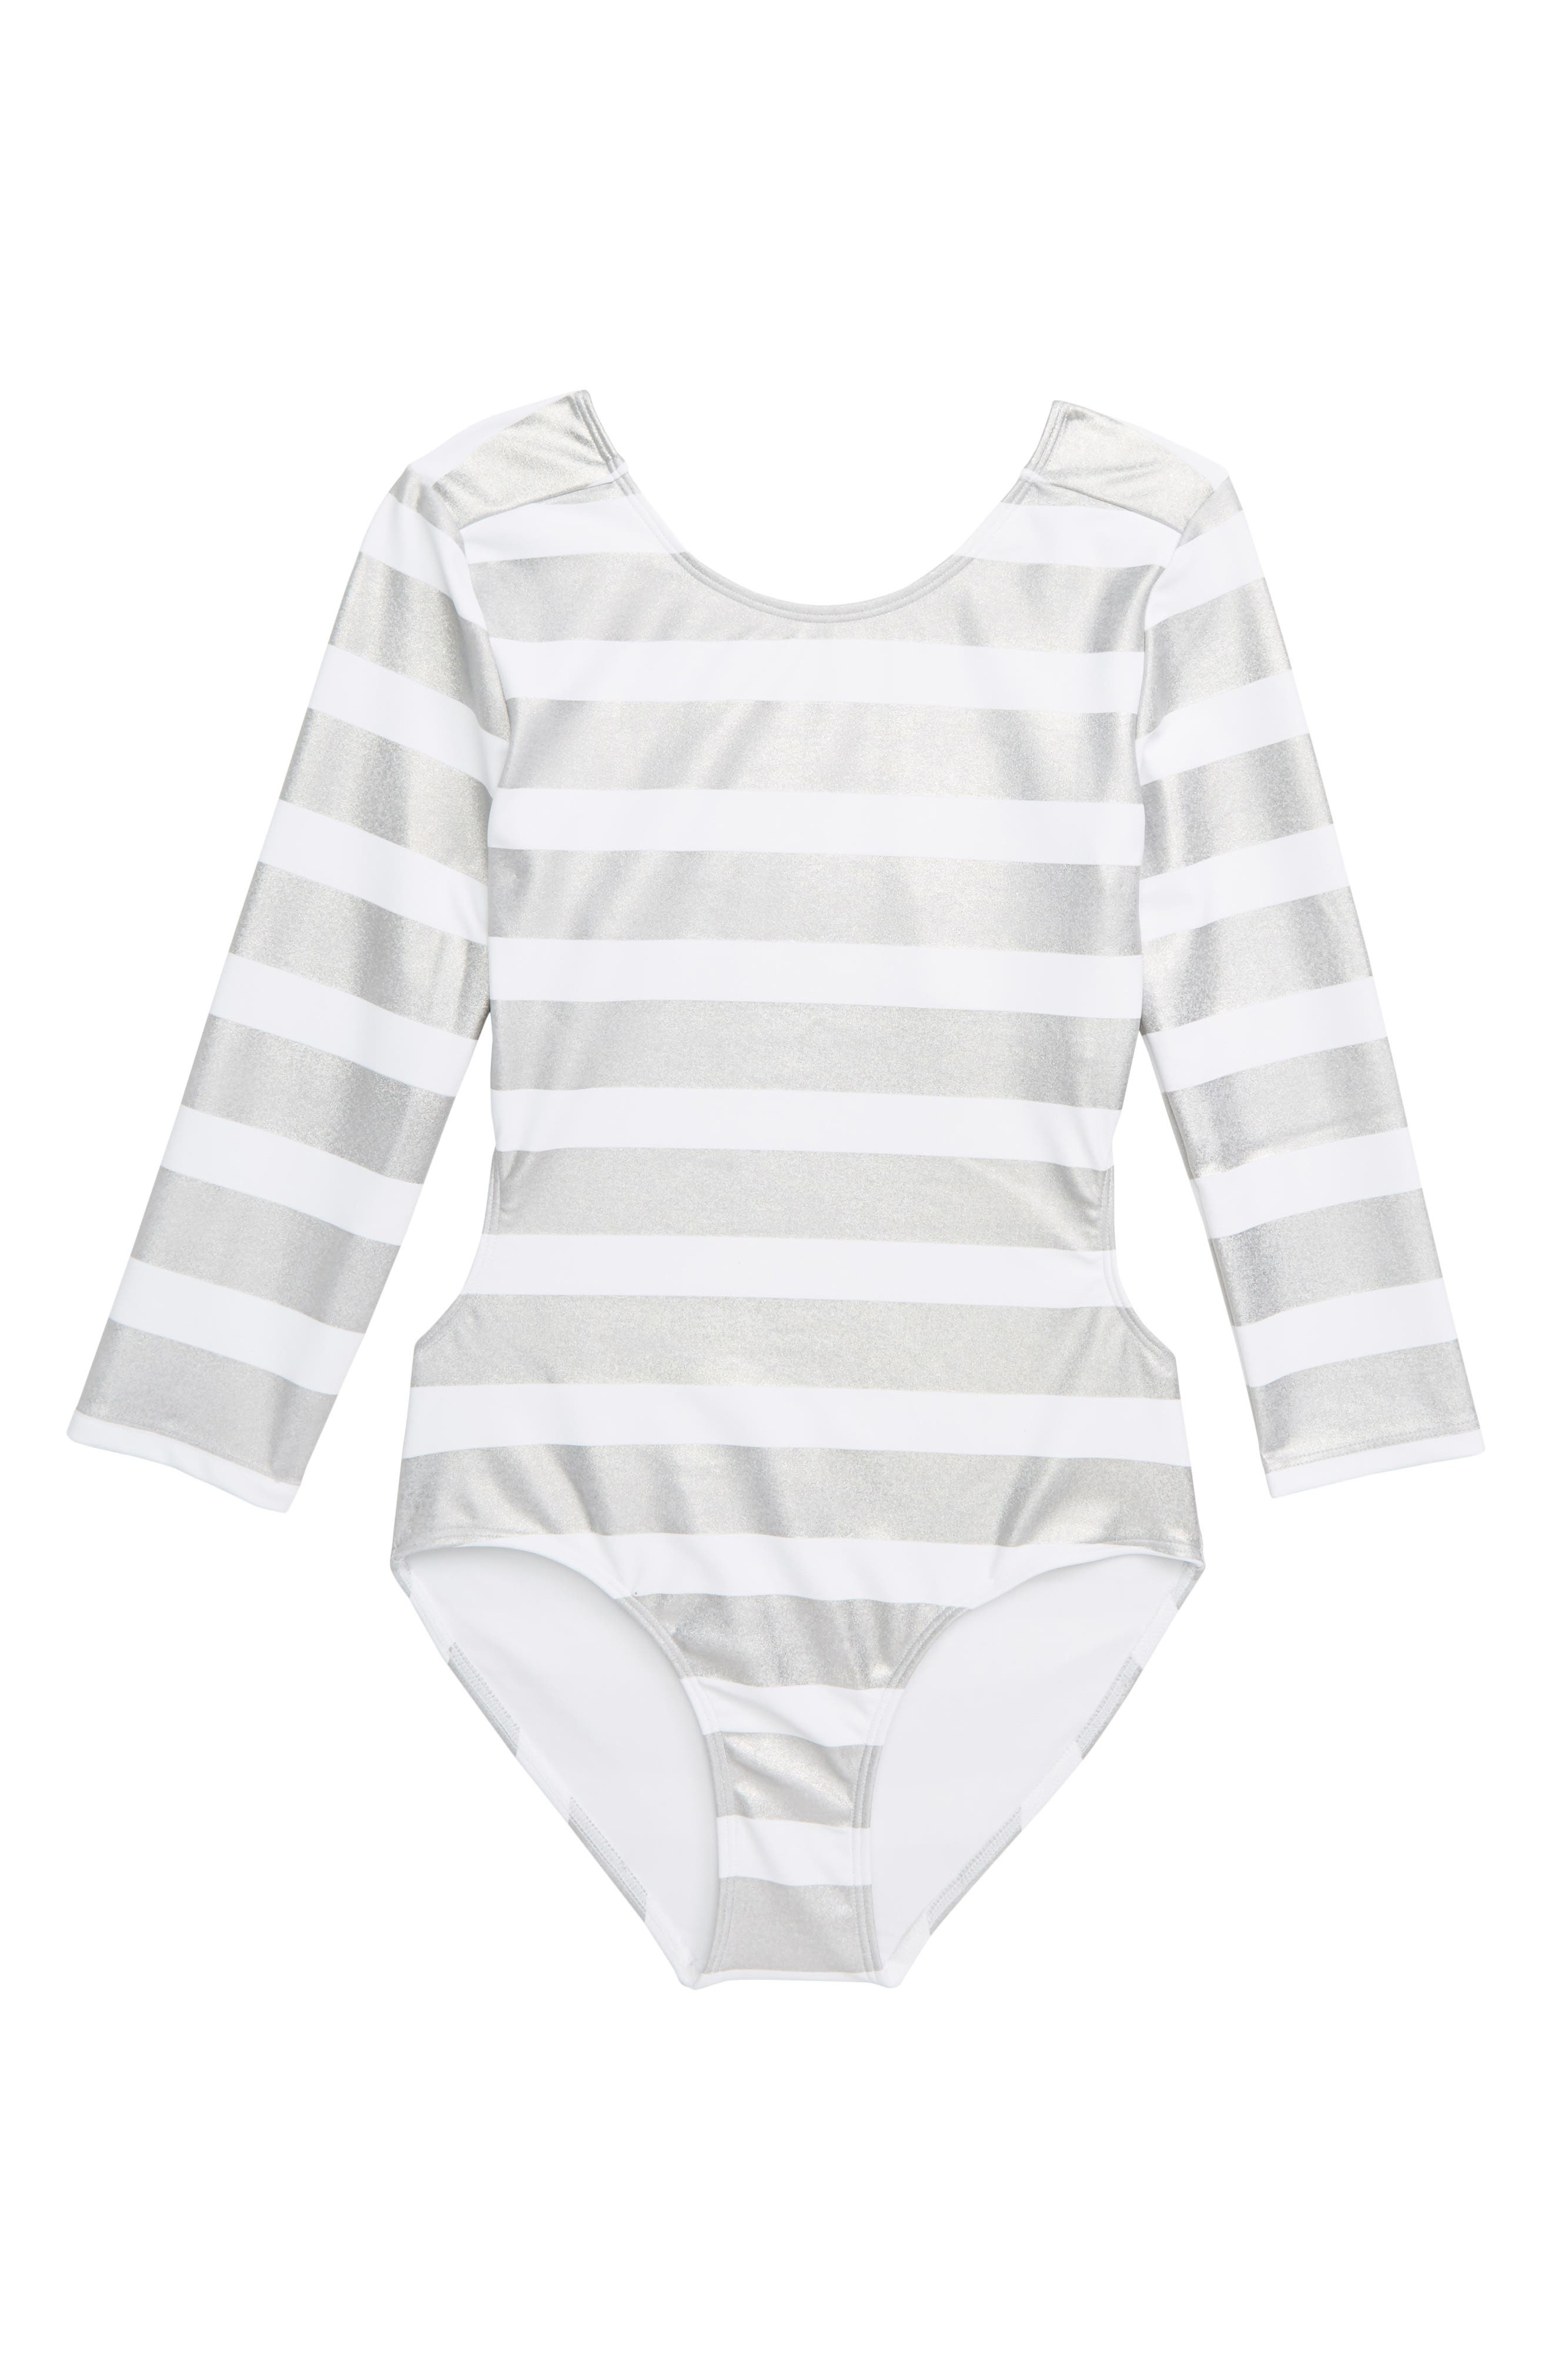 ZELLA GIRL,                             Mirror Stripe One-Piece Swimsuit,                             Main thumbnail 1, color,                             WHITE MULTI FOIL STRIPE